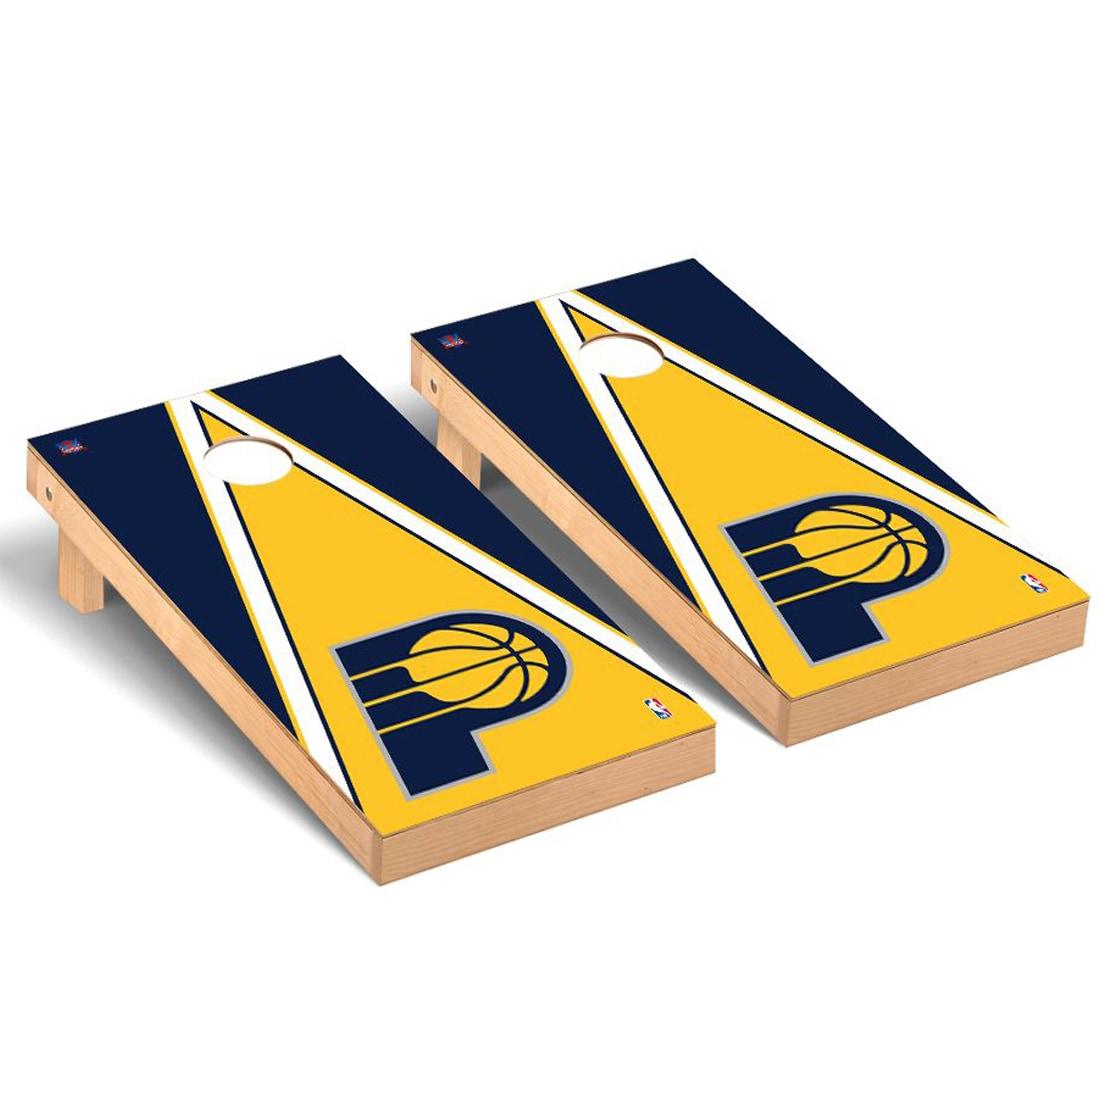 Indiana Pacers 2' x 4' Triangle Museum Cornhole Board Tailgate Toss Set